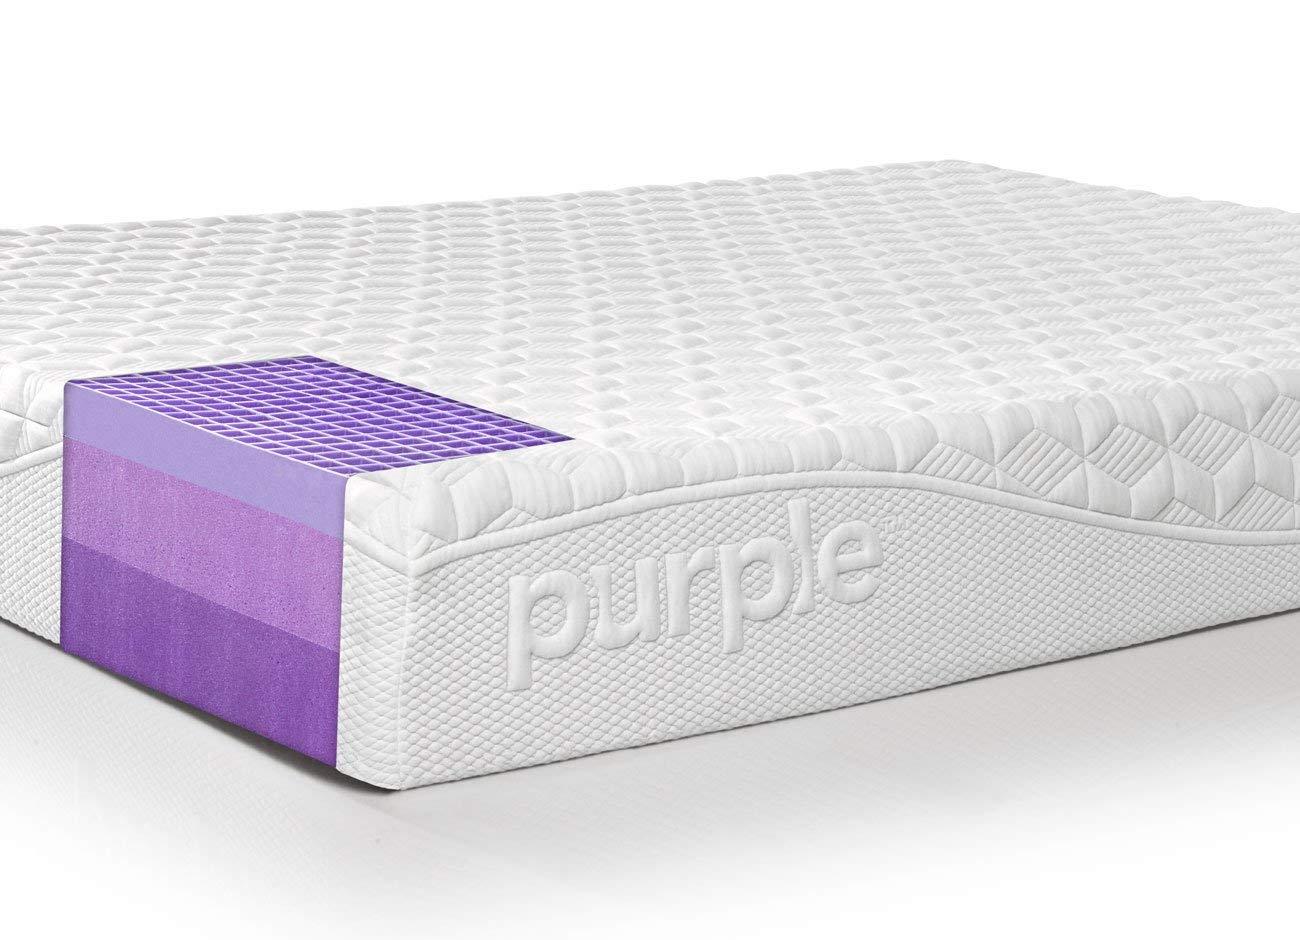 Purple Queen Memory Foam Mattress Under 1000 $ topratedhomeproducts info